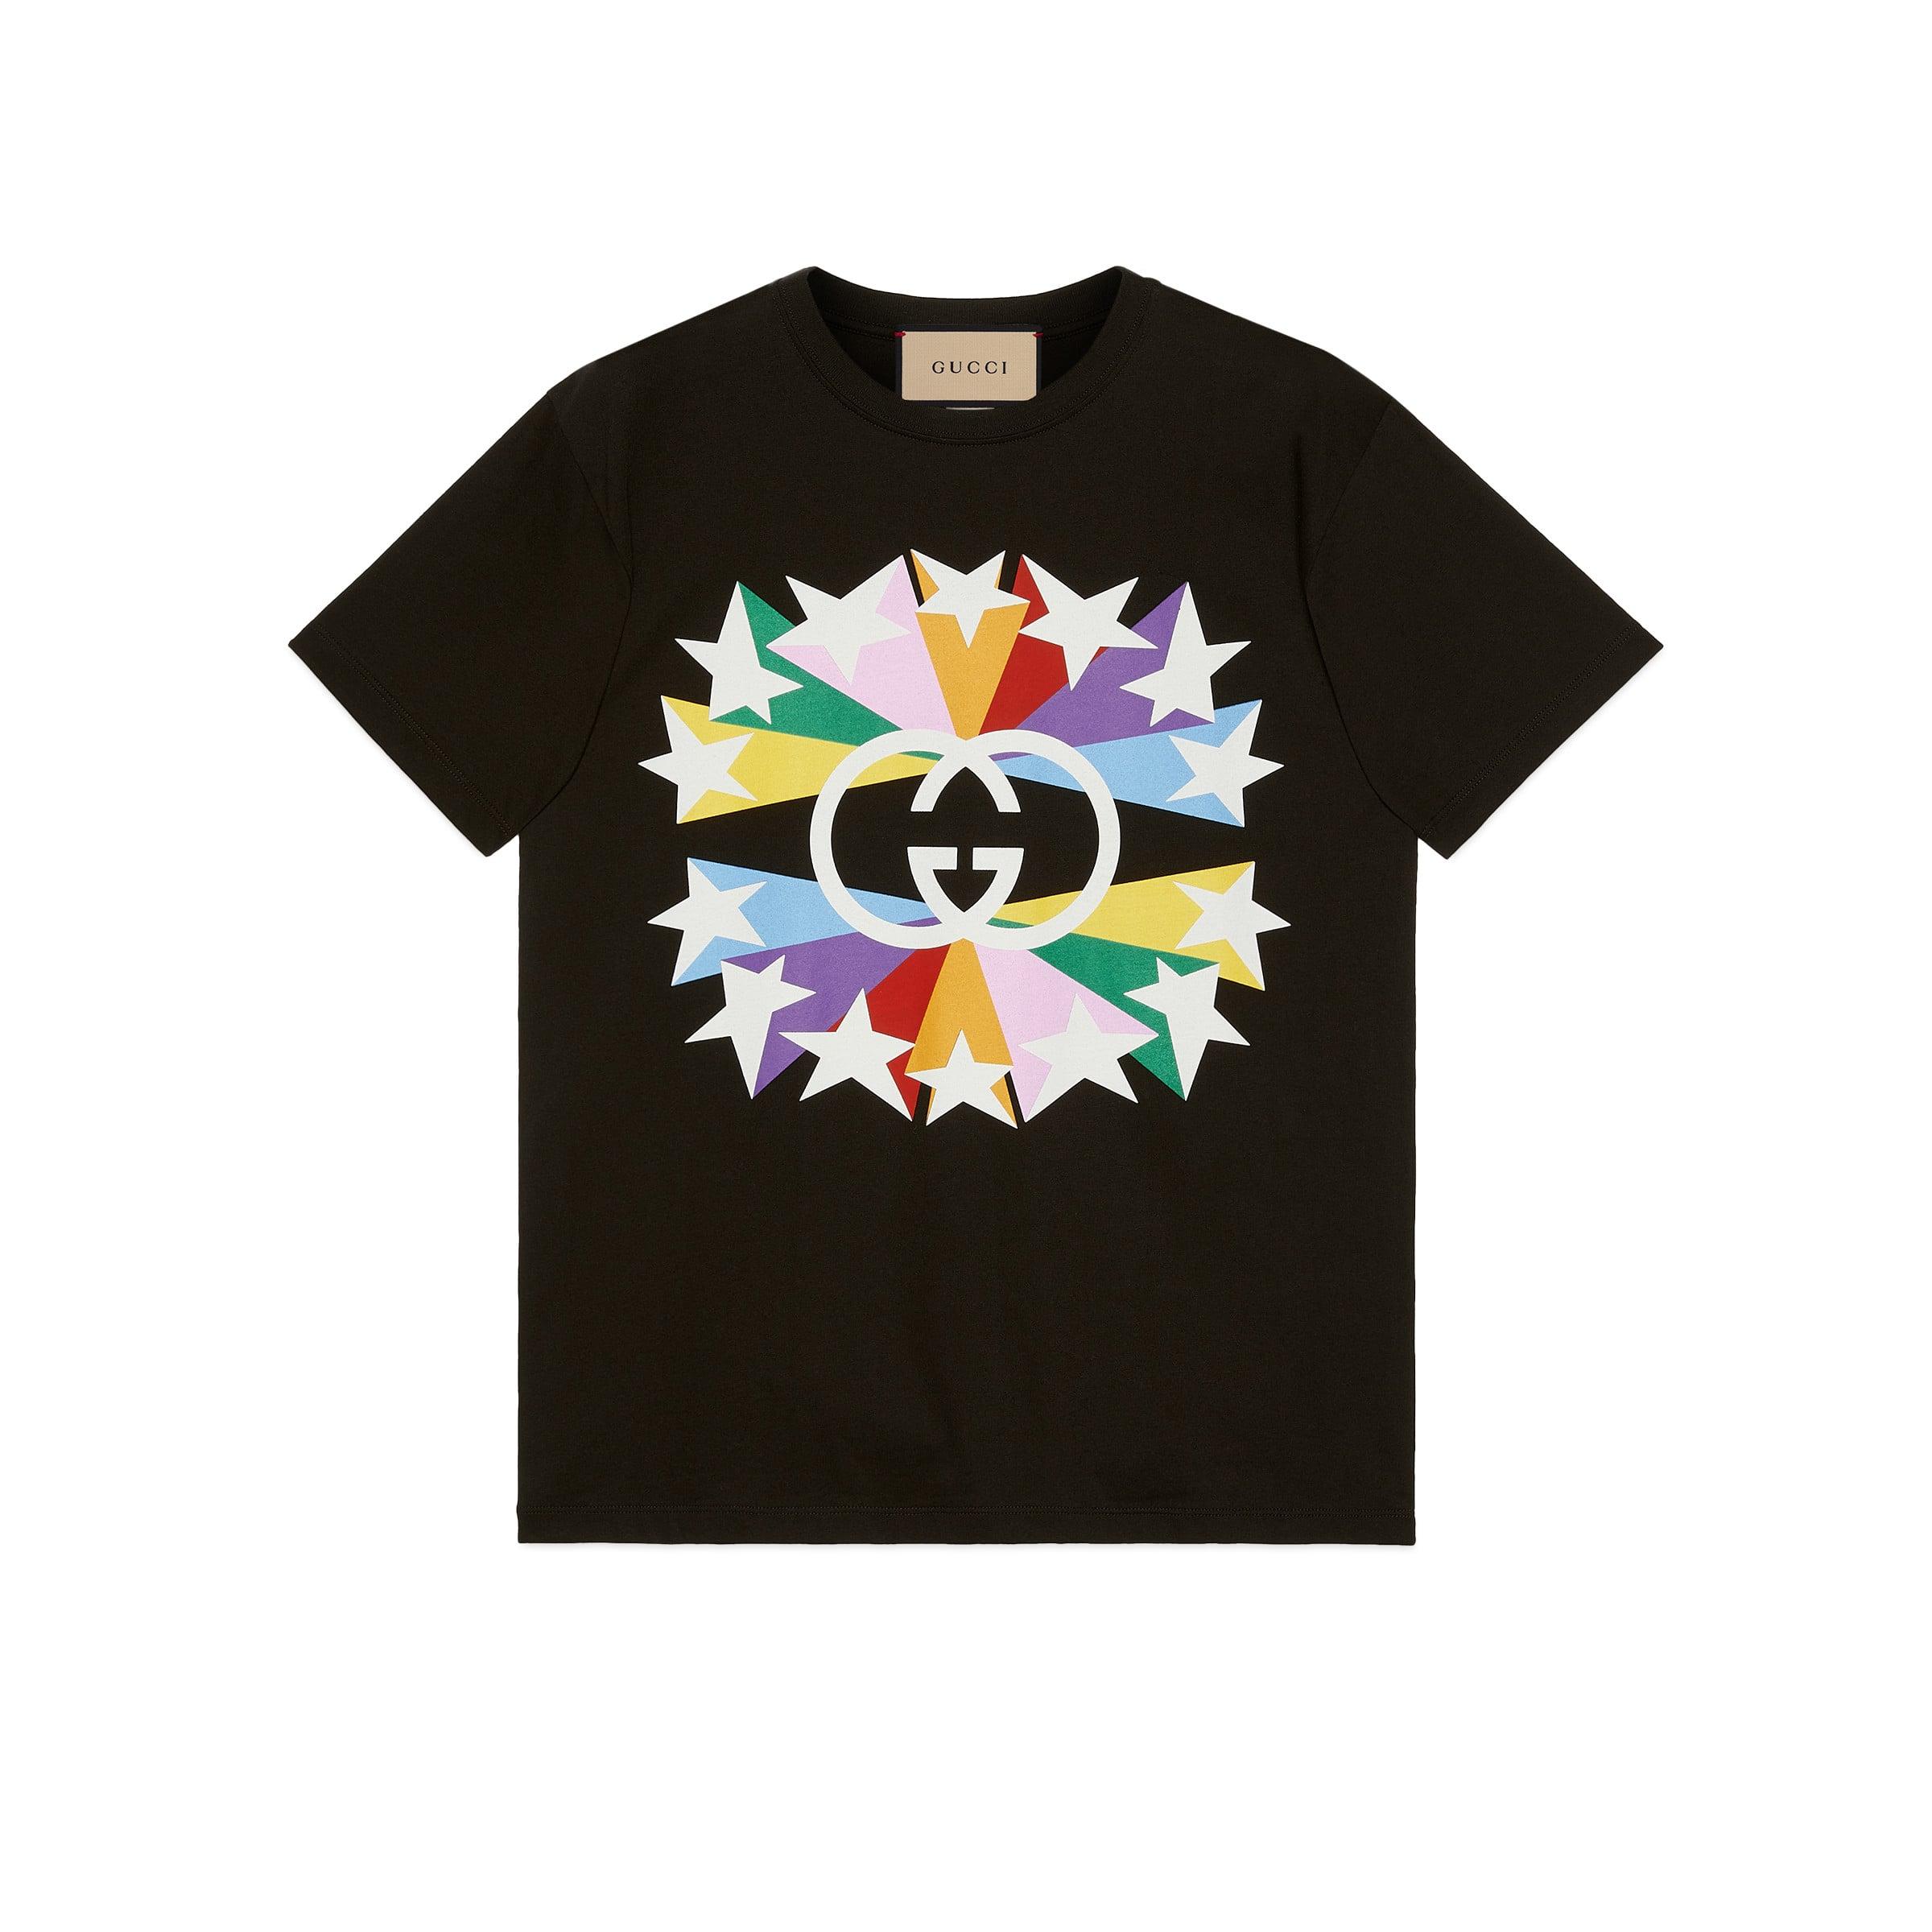 Gucci Men's Interlocking G star T-shirt  - Black